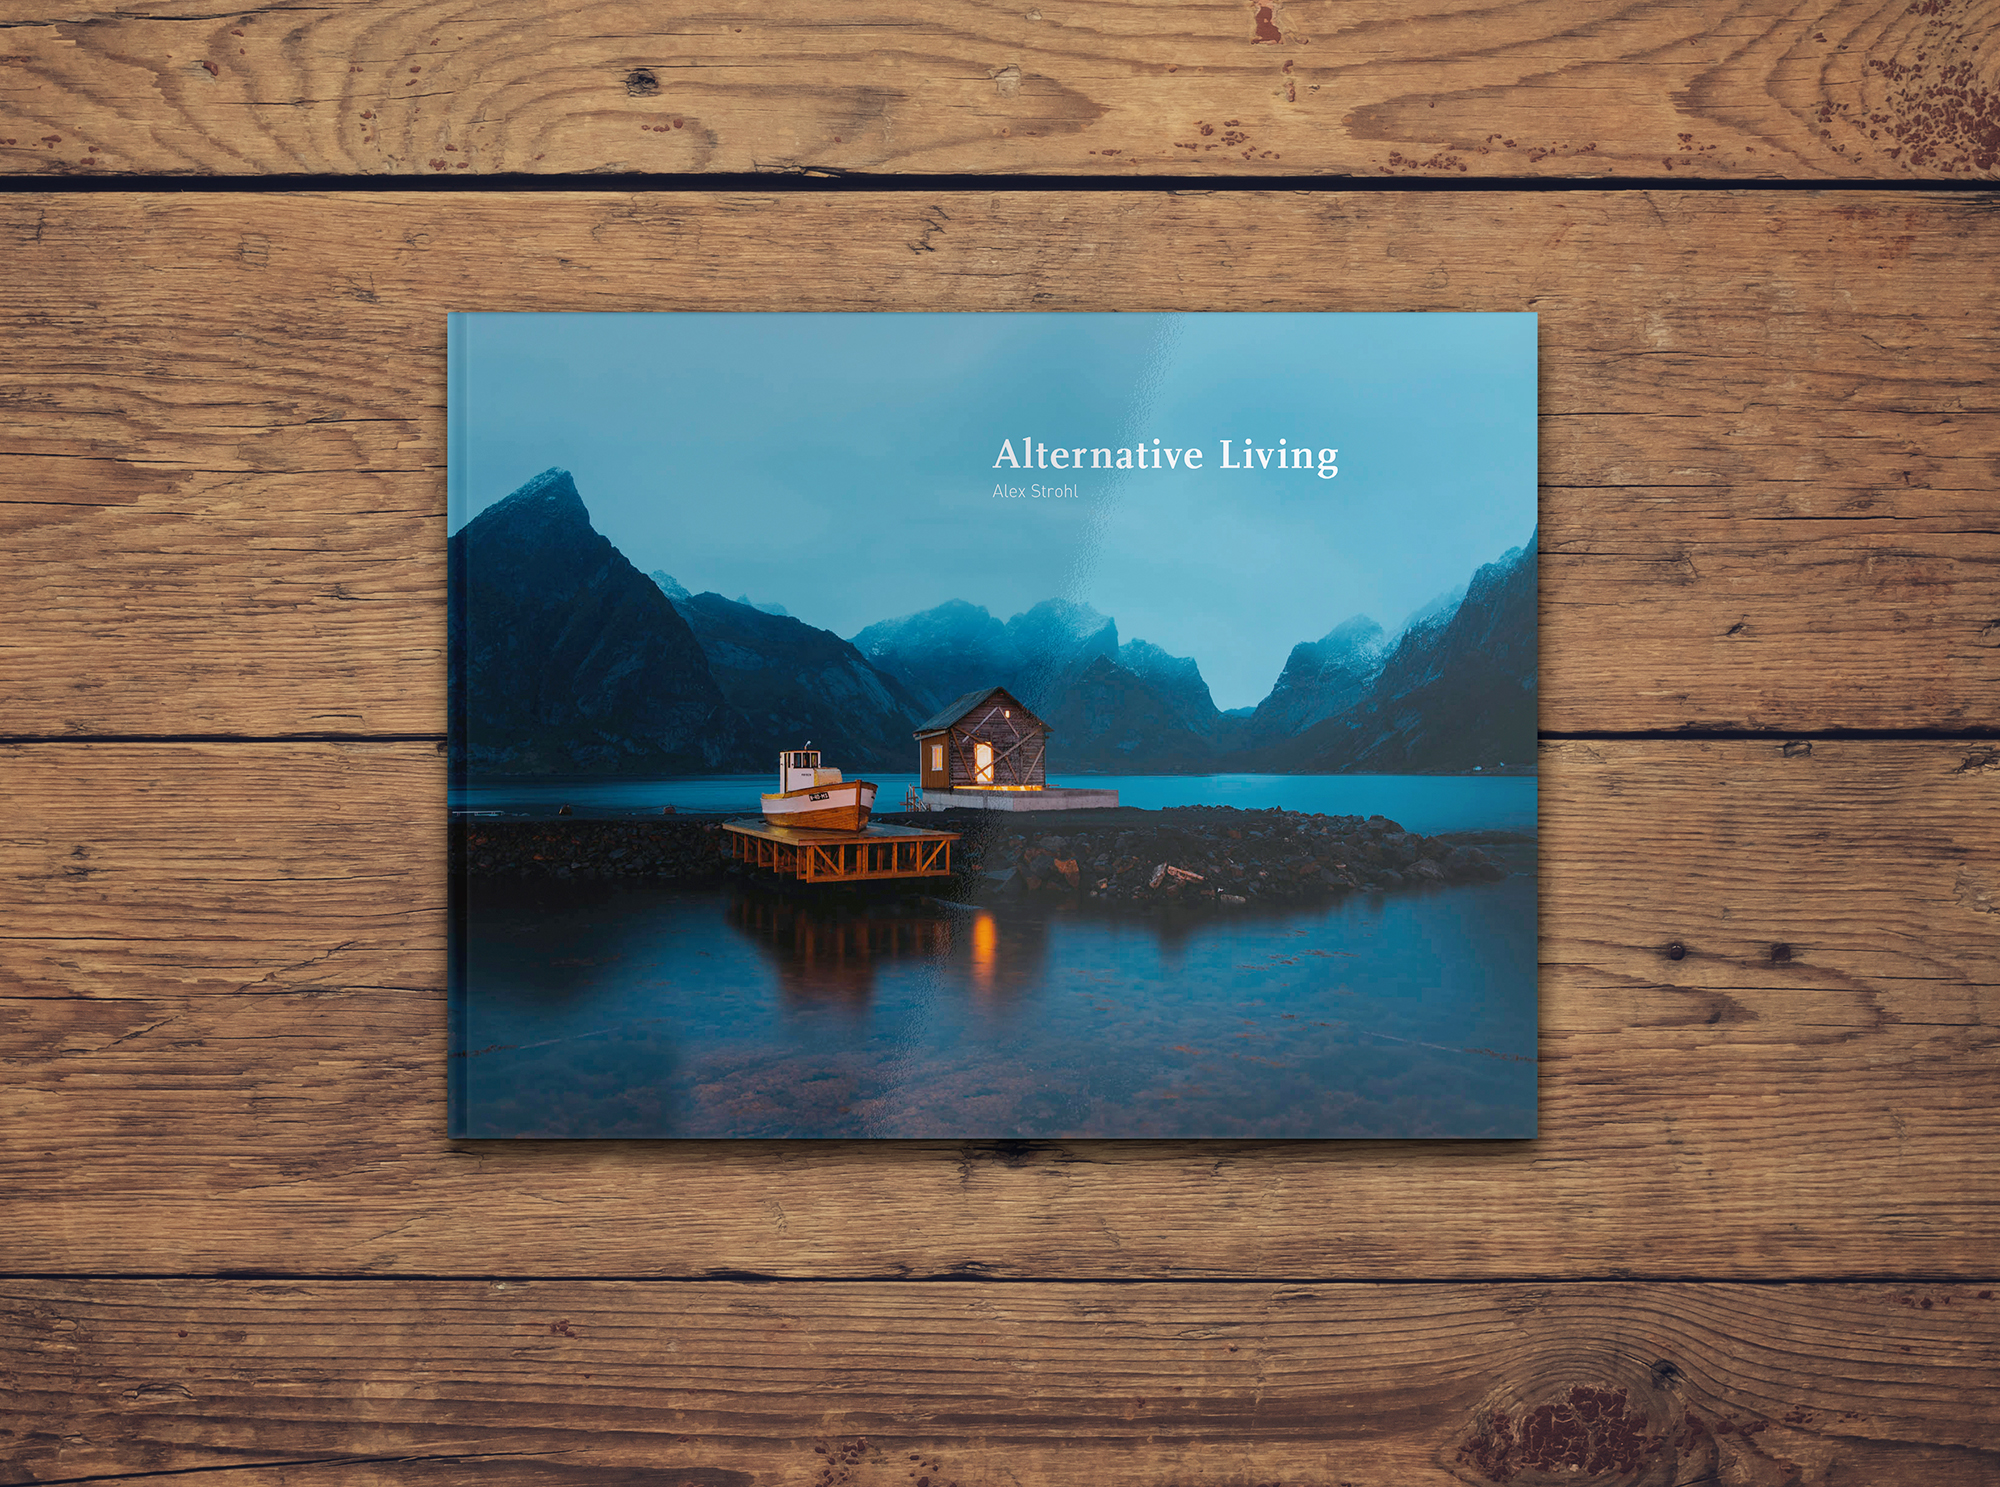 Alternative-Living-Book_Alex-Strohl_small.jpg